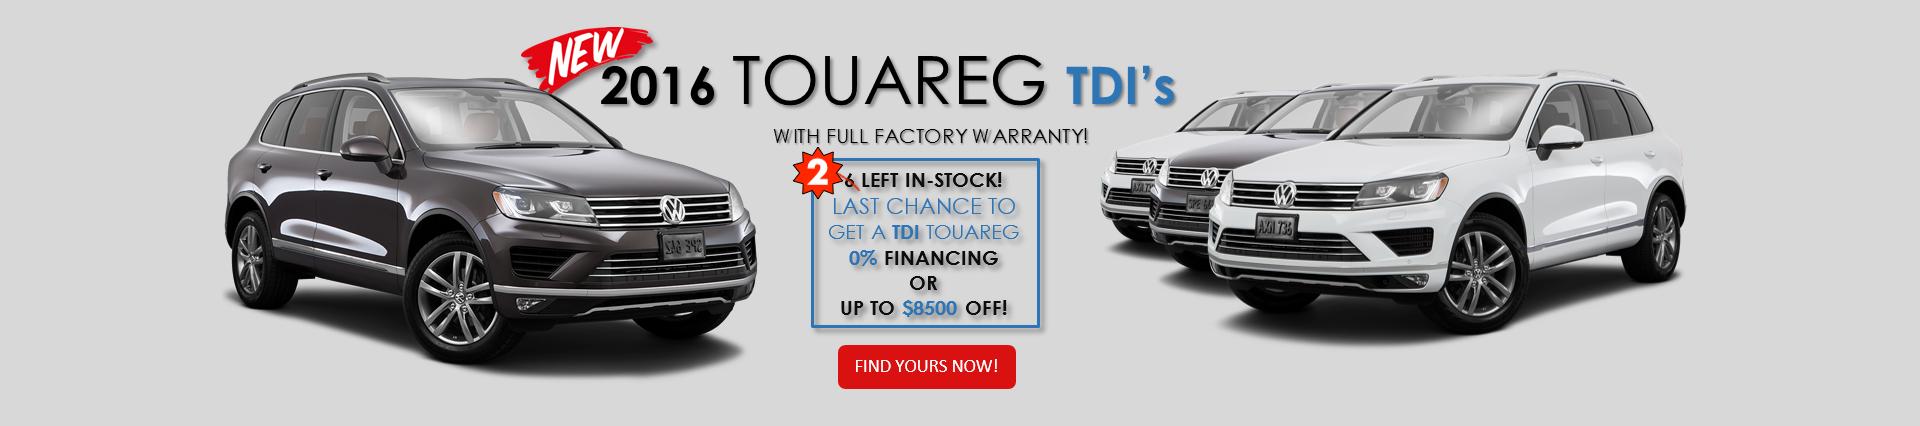 2016 Touareg TDI's